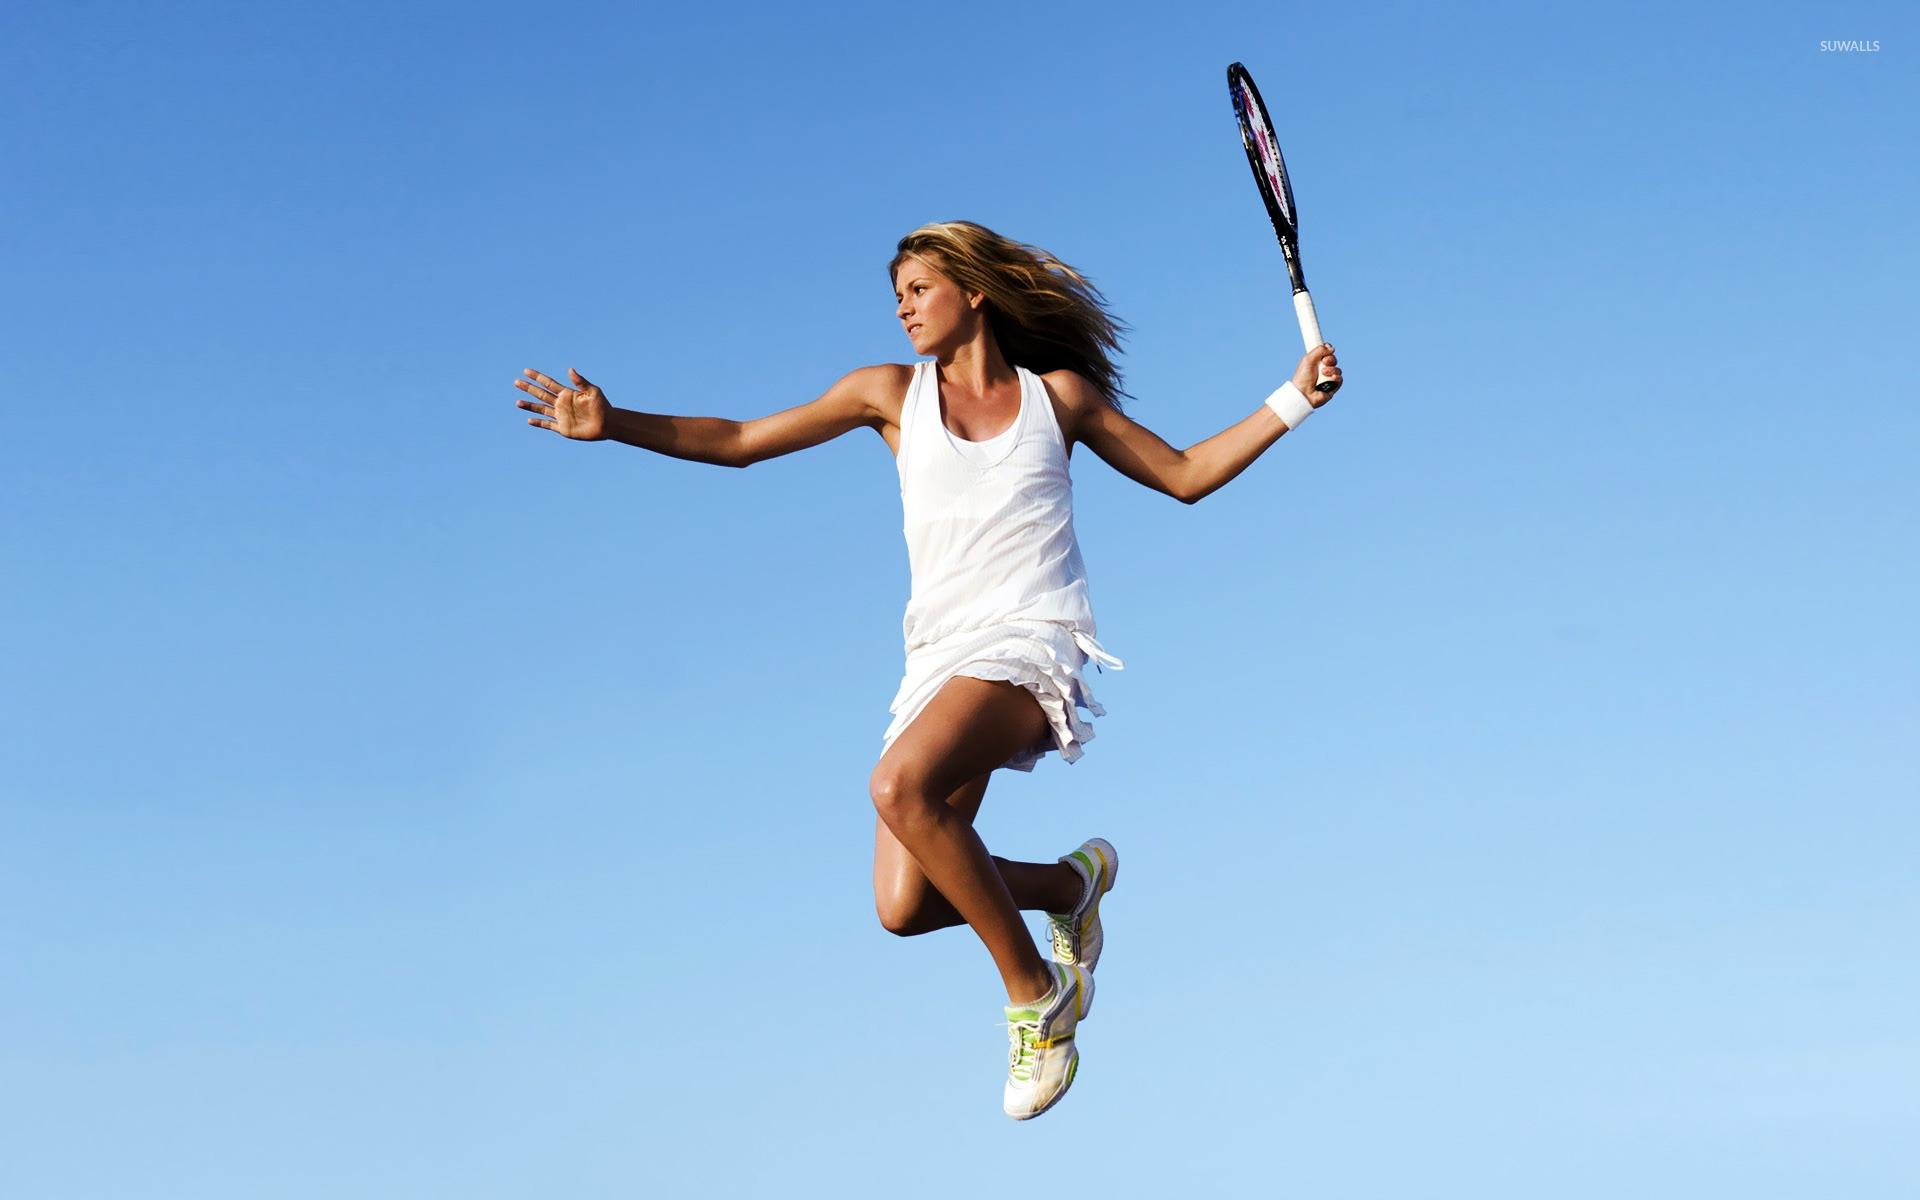 Maria Kirilenko 5 Wallpaper Sport Wallpapers 12976